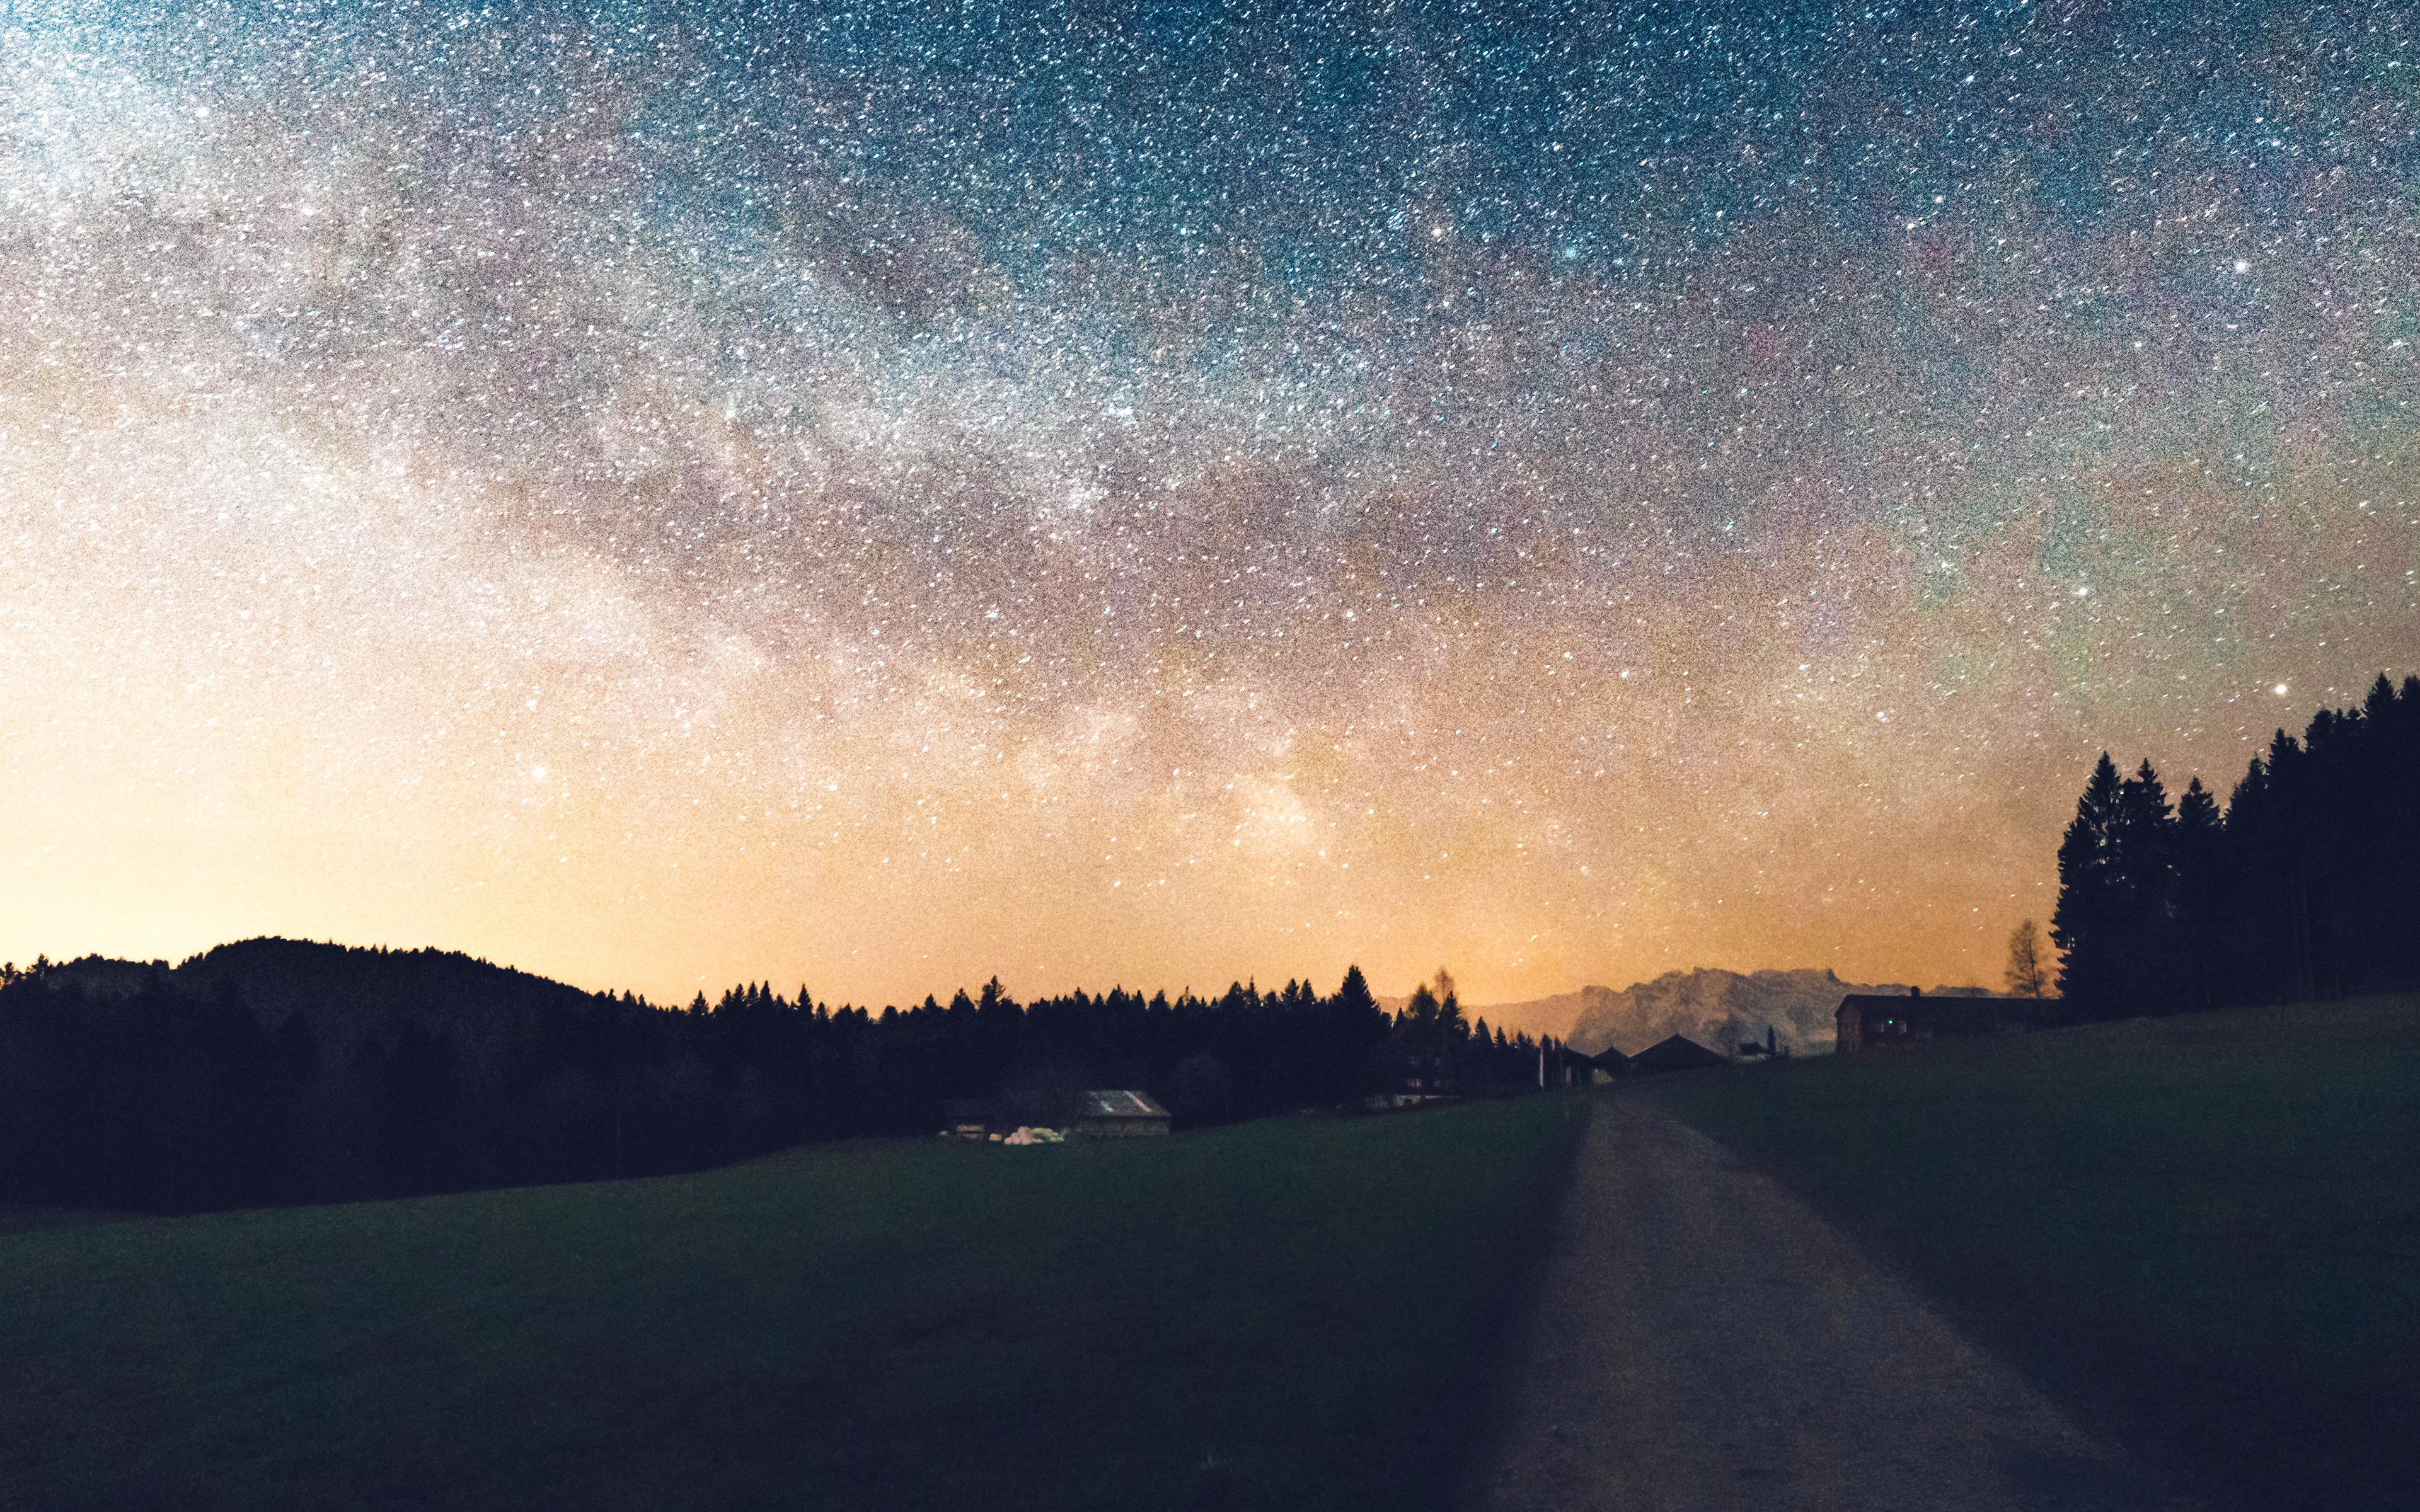 Nn93 Starry Sky Nature Sunset Mountain Road Wallpaper